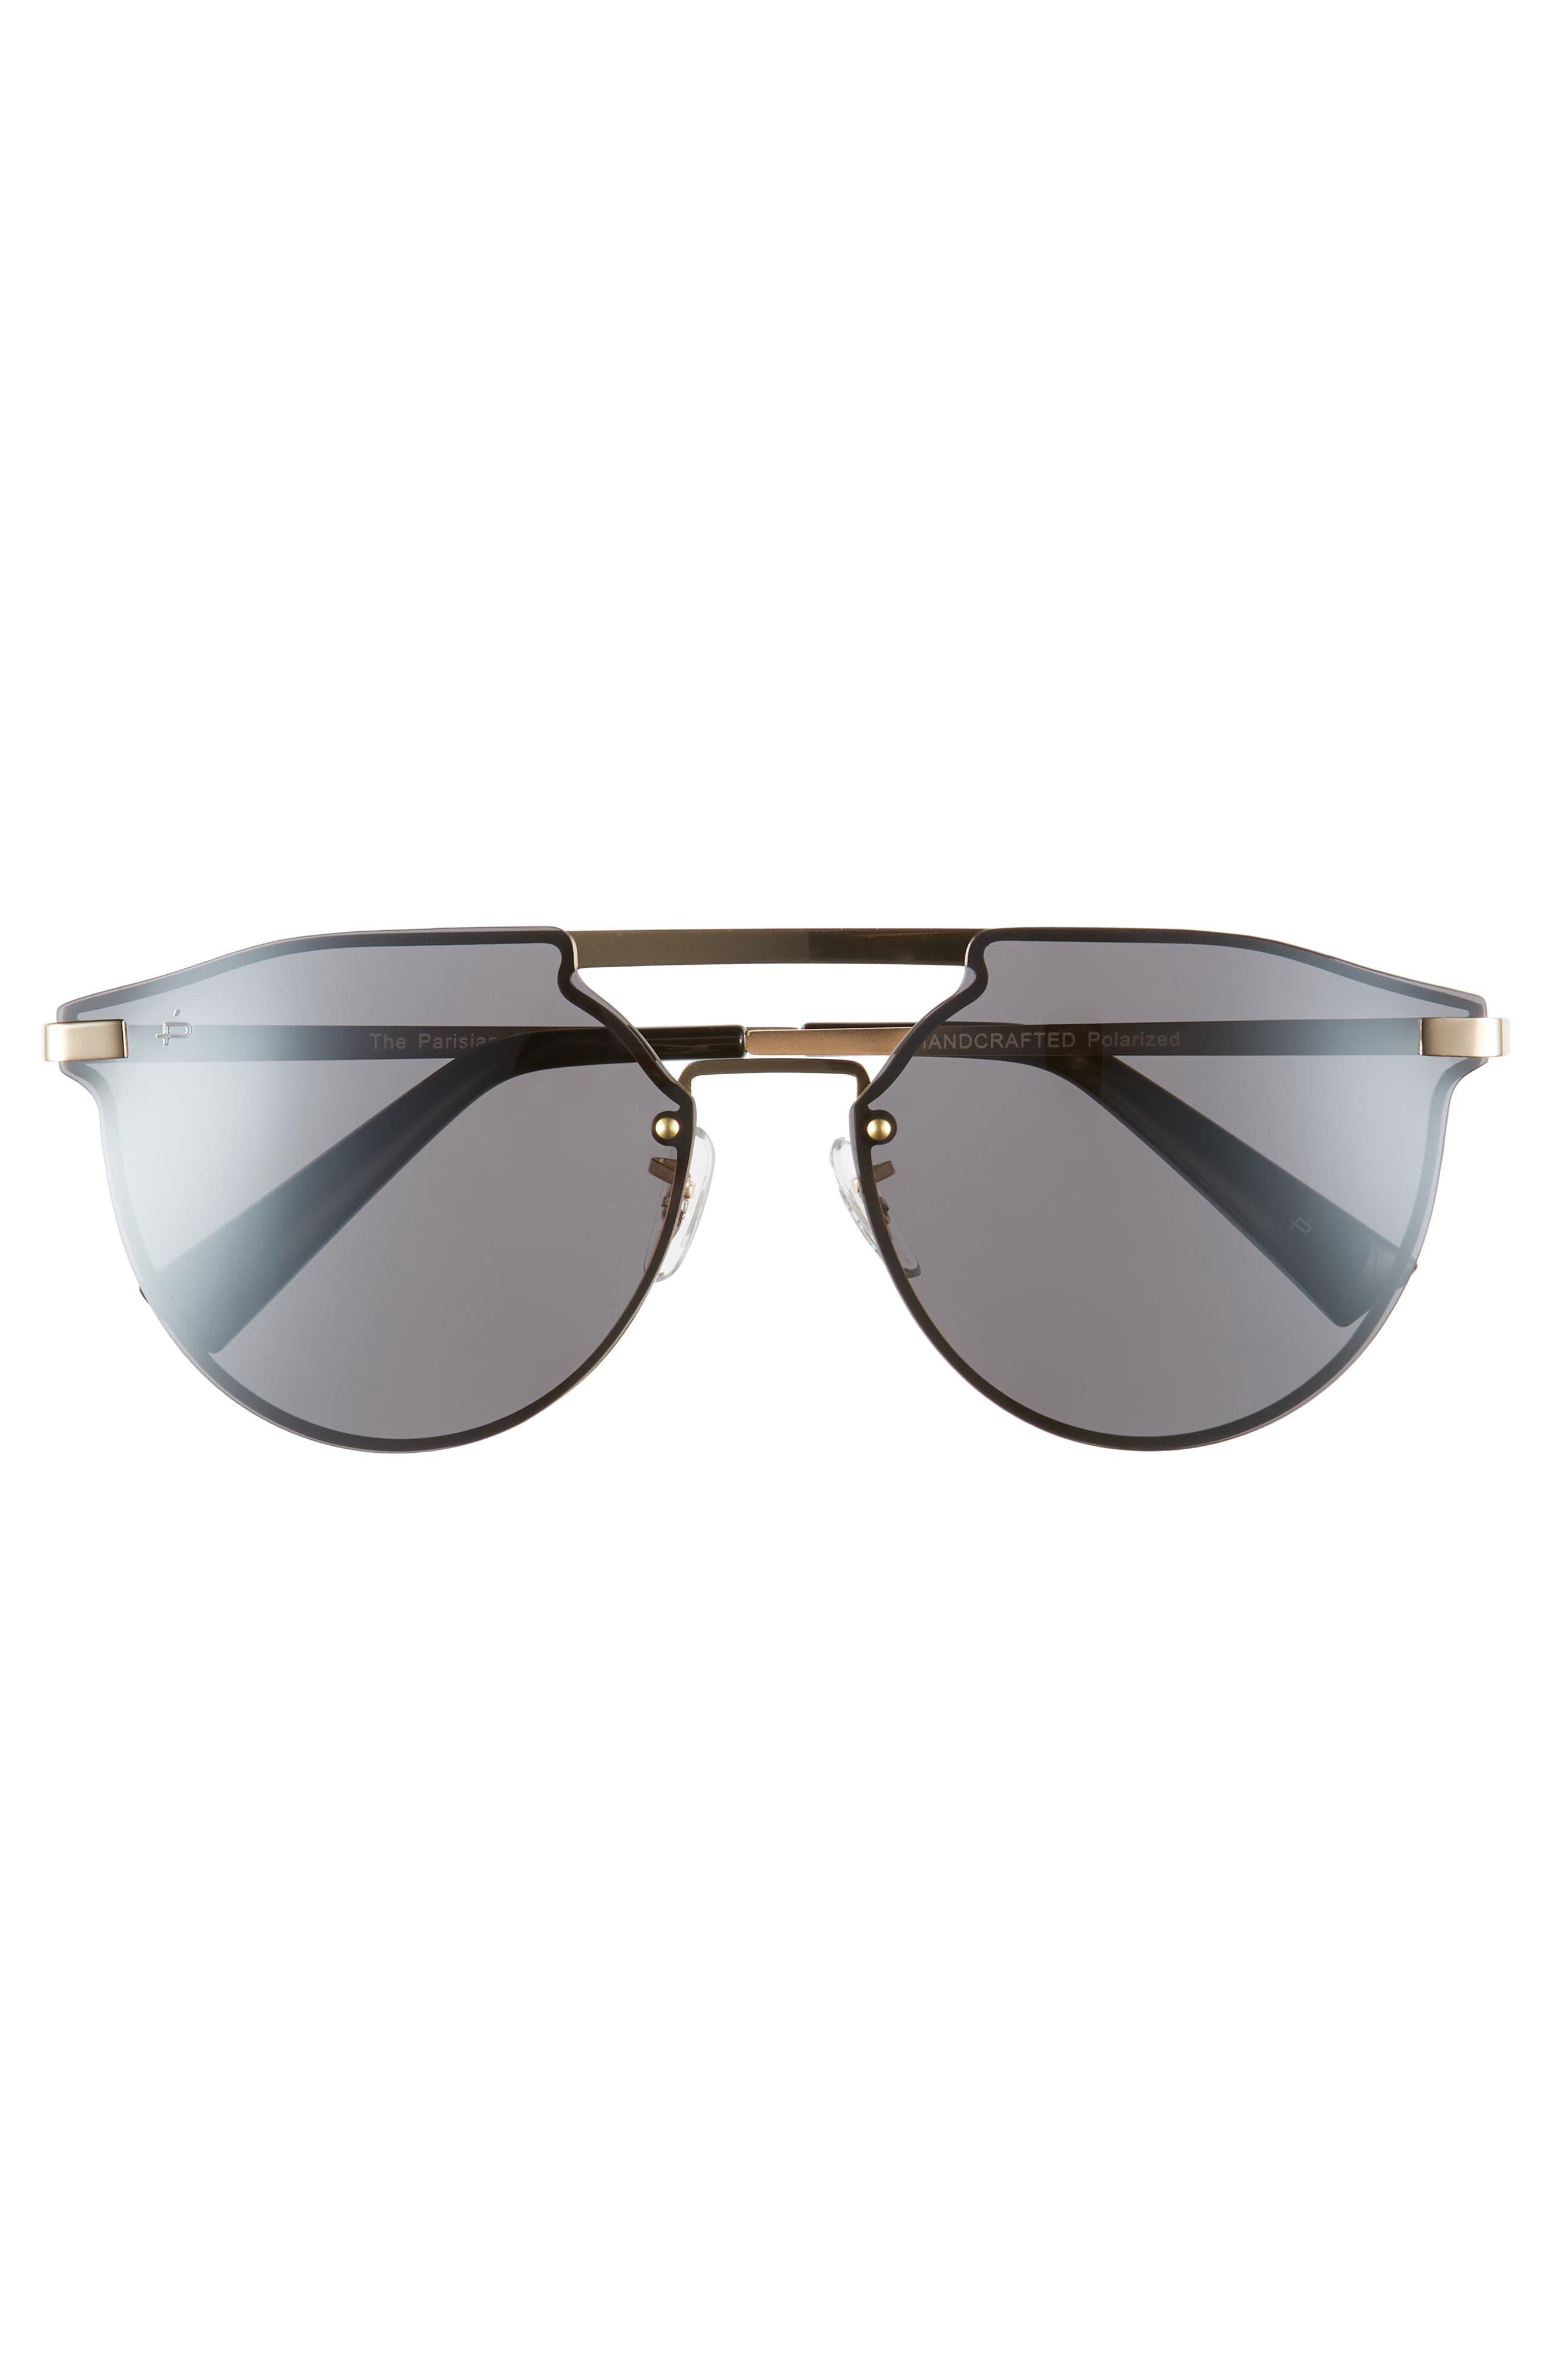 Privé Revaux The Parisian 62mm Aviator Sunglasses,                             Alternate thumbnail 3, color,                             040